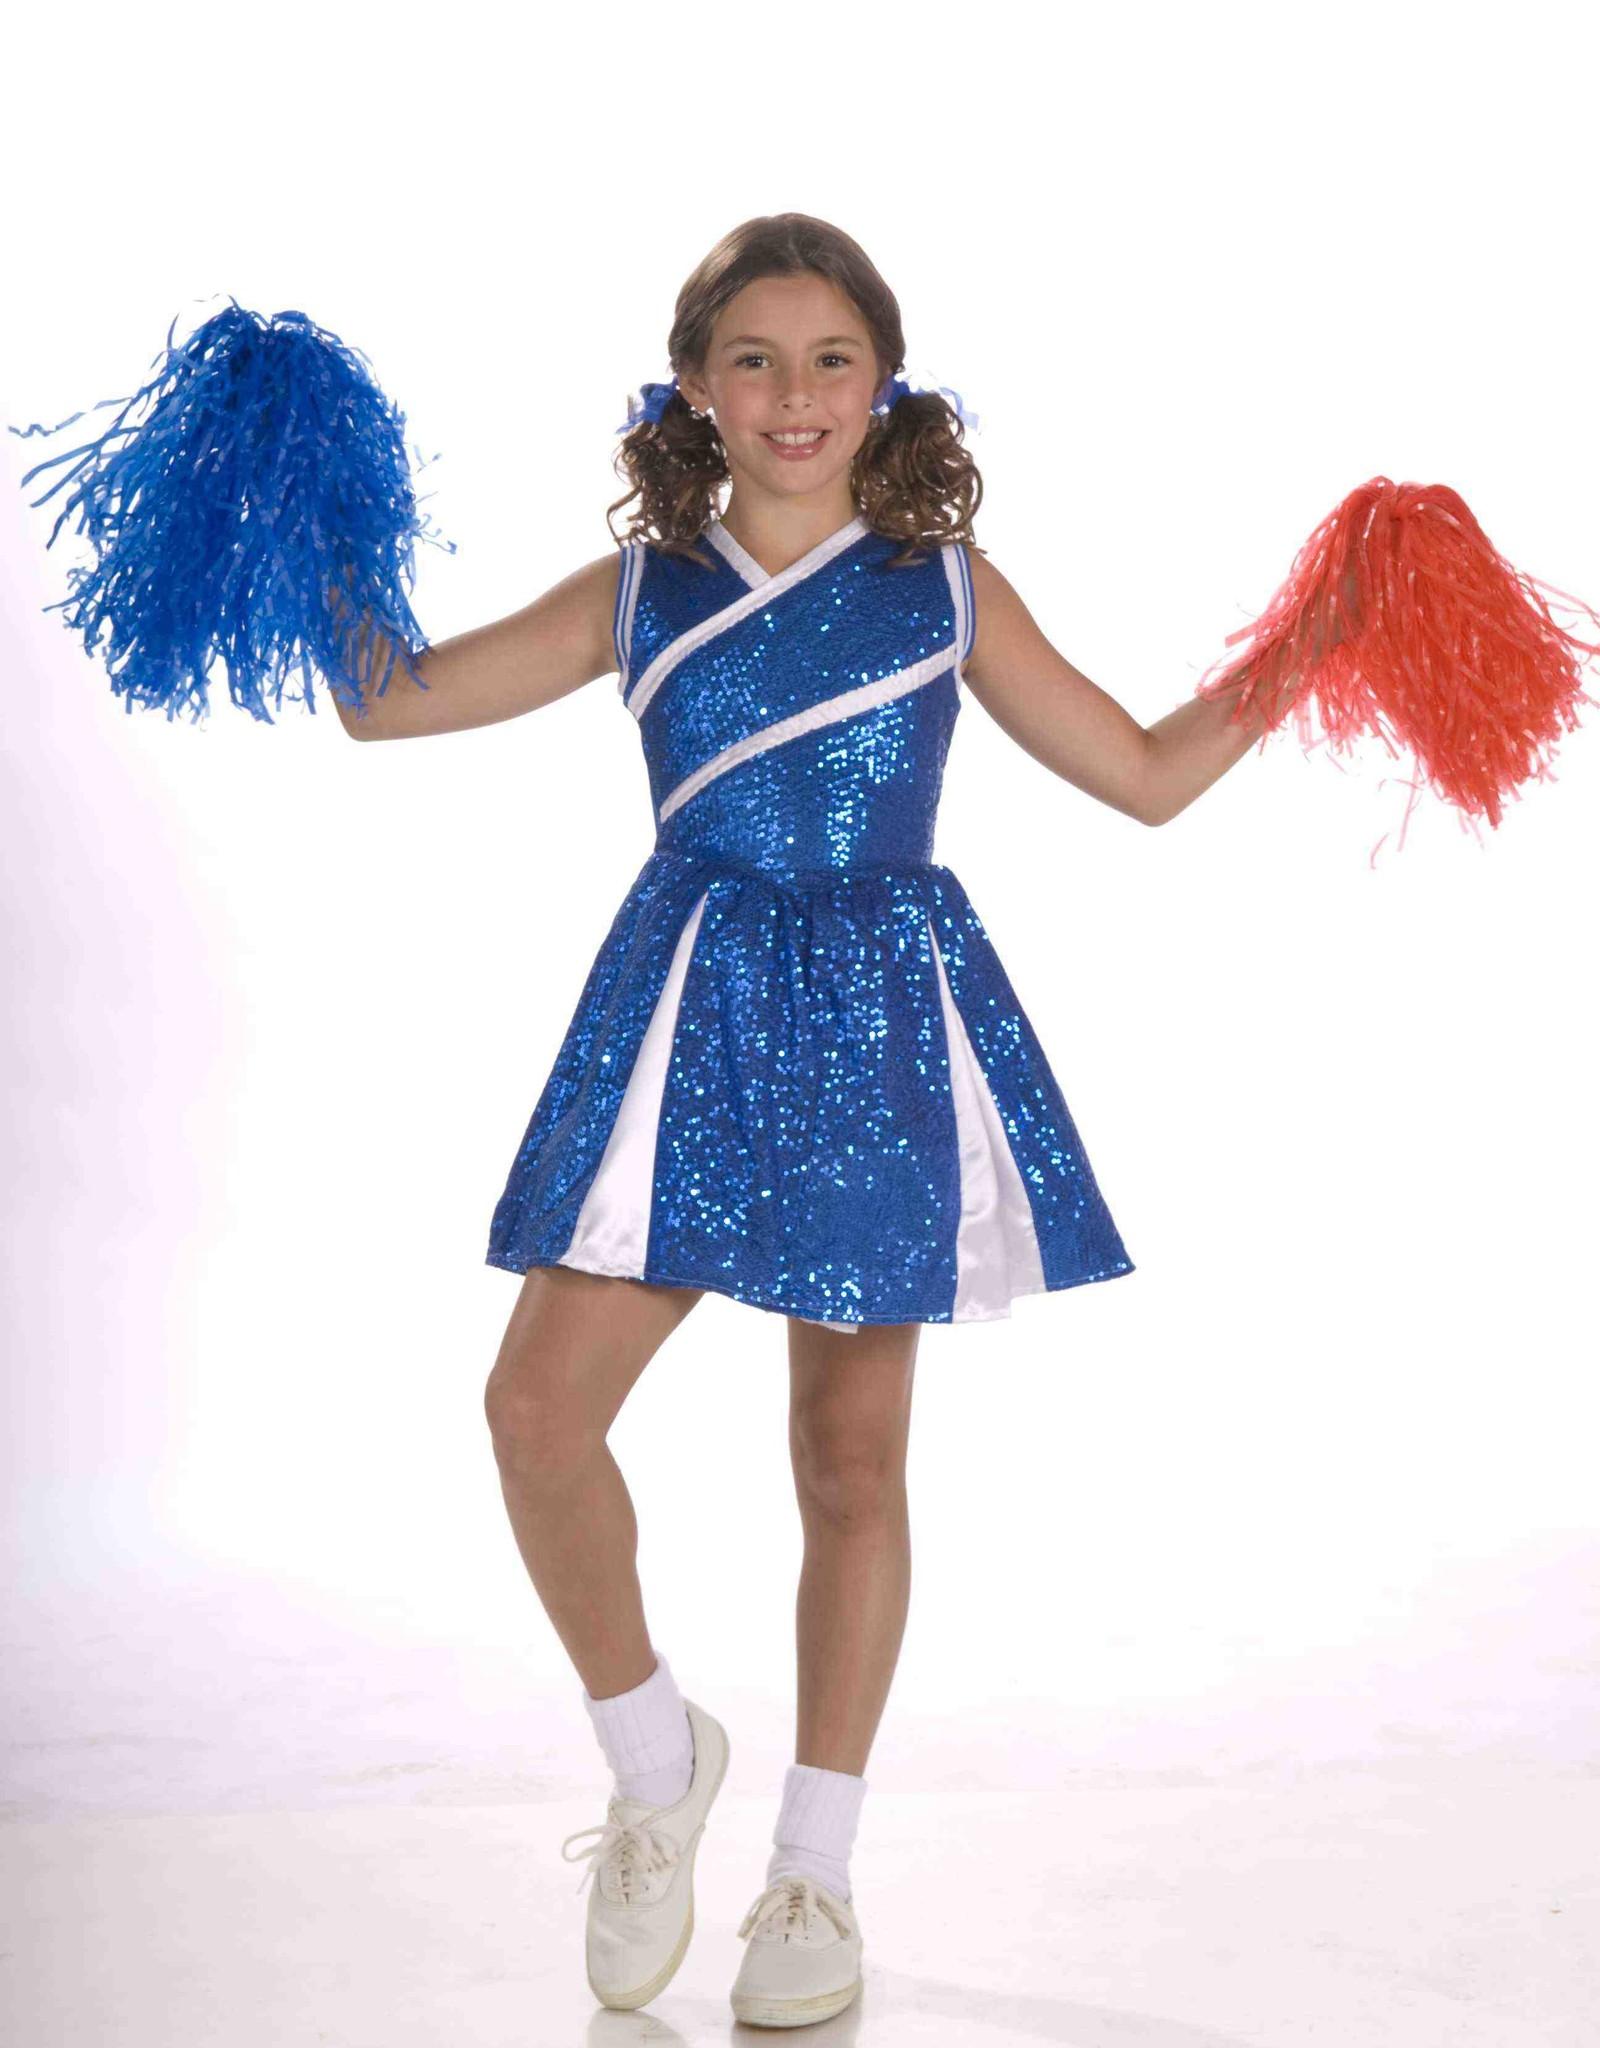 Sassy Cheerleader